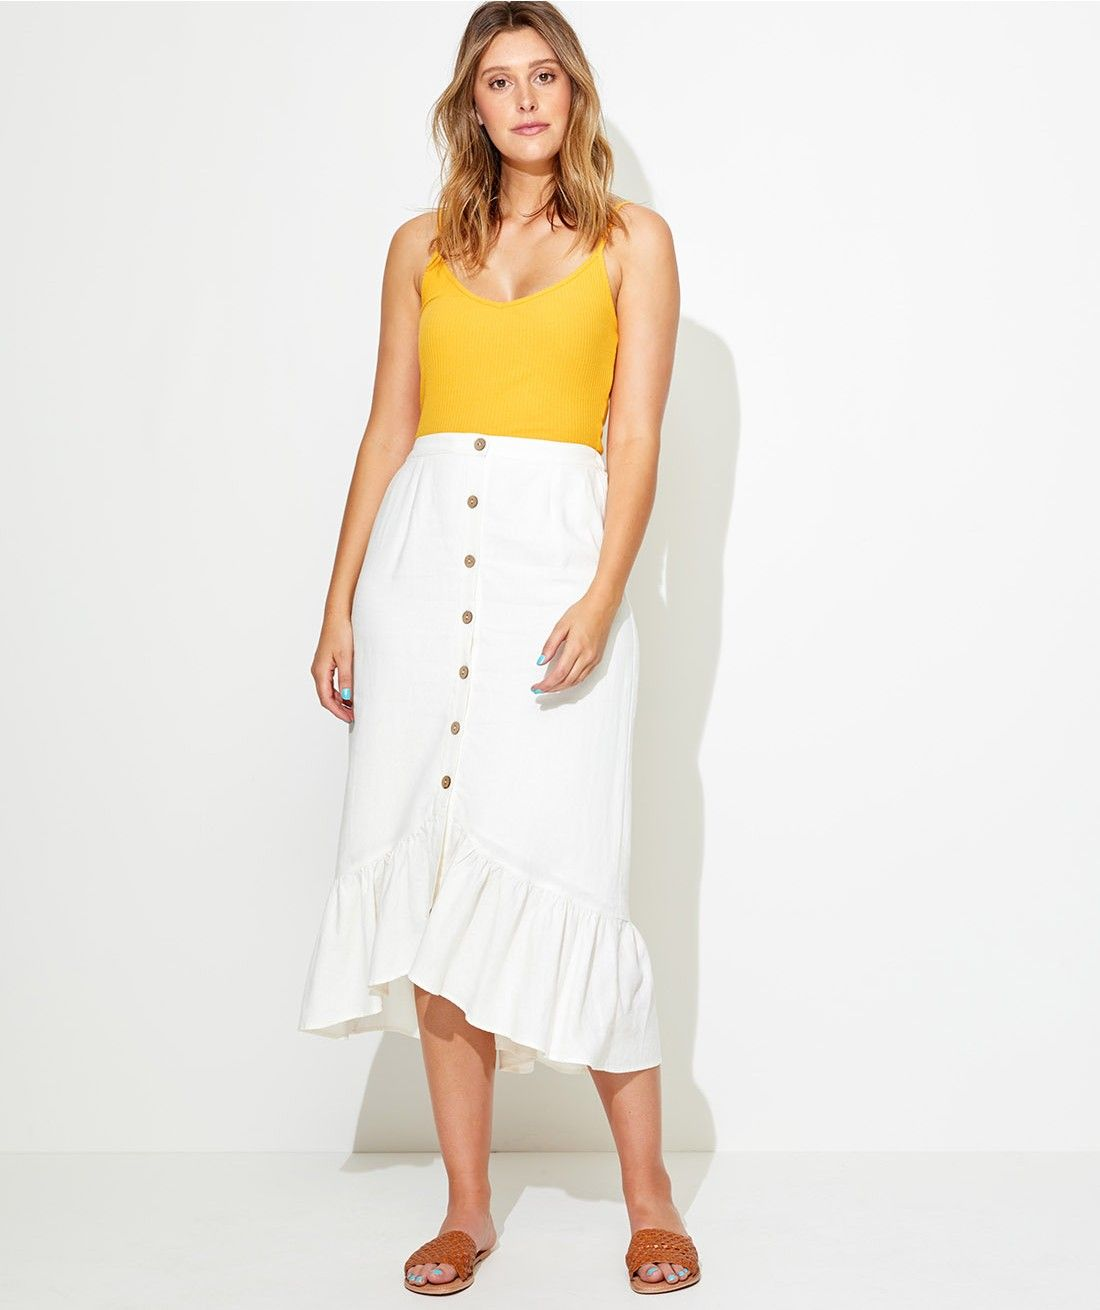 7a924c09335 Linen Edit - Ruffle Hem Linen Midi Skirt - Clothing - Sportsgirl ...